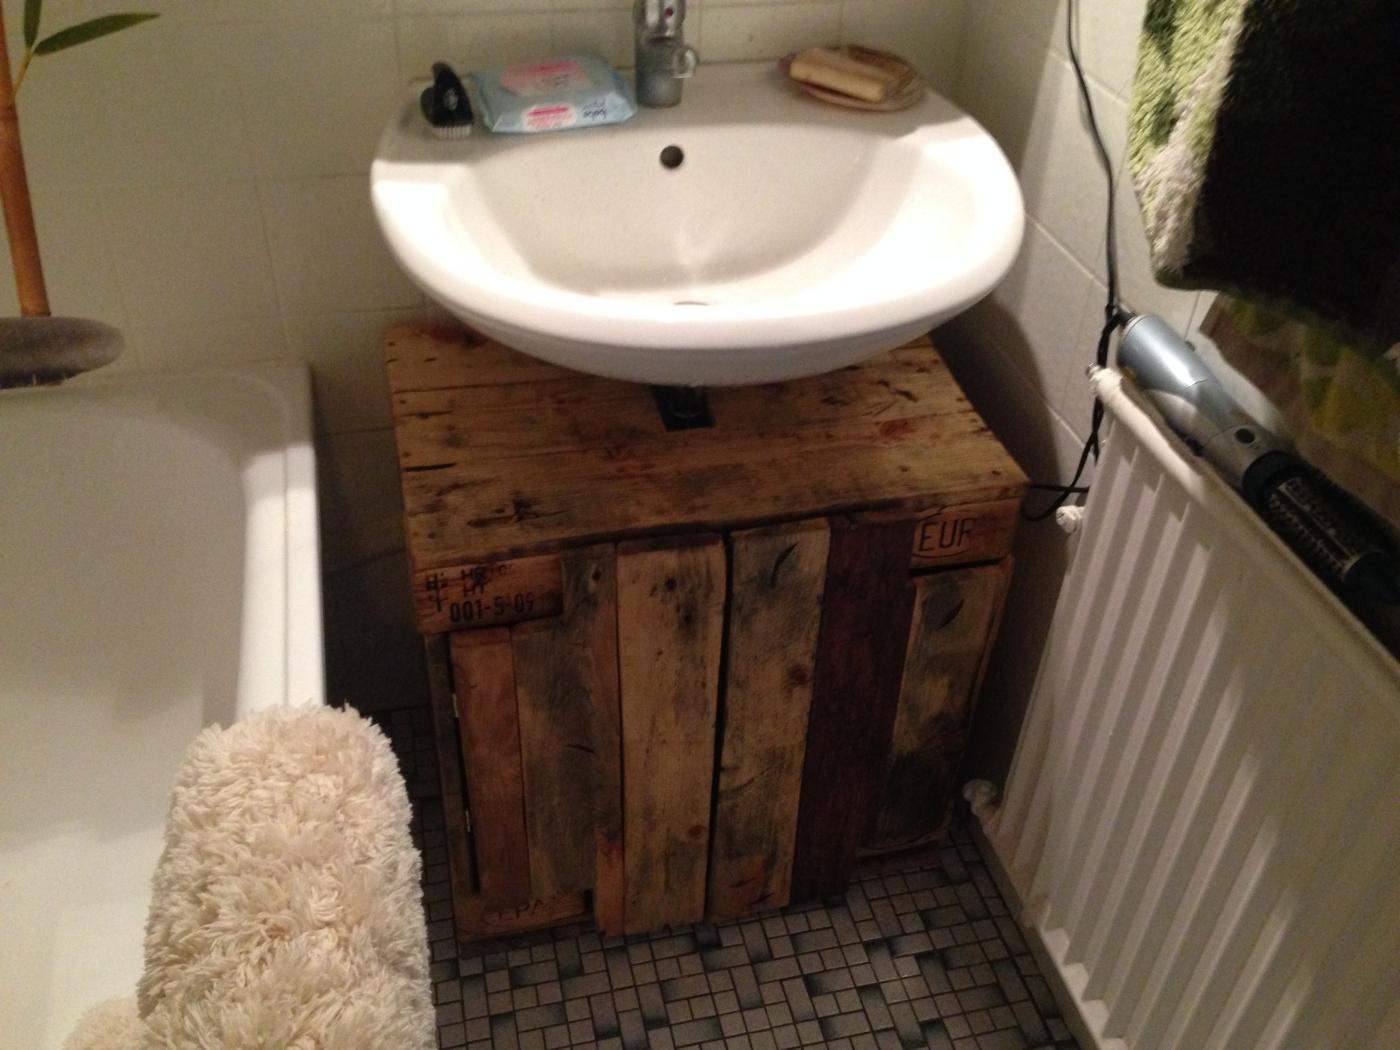 Bathroom Cabinet Cupboard Below Sink From Pallet Timber